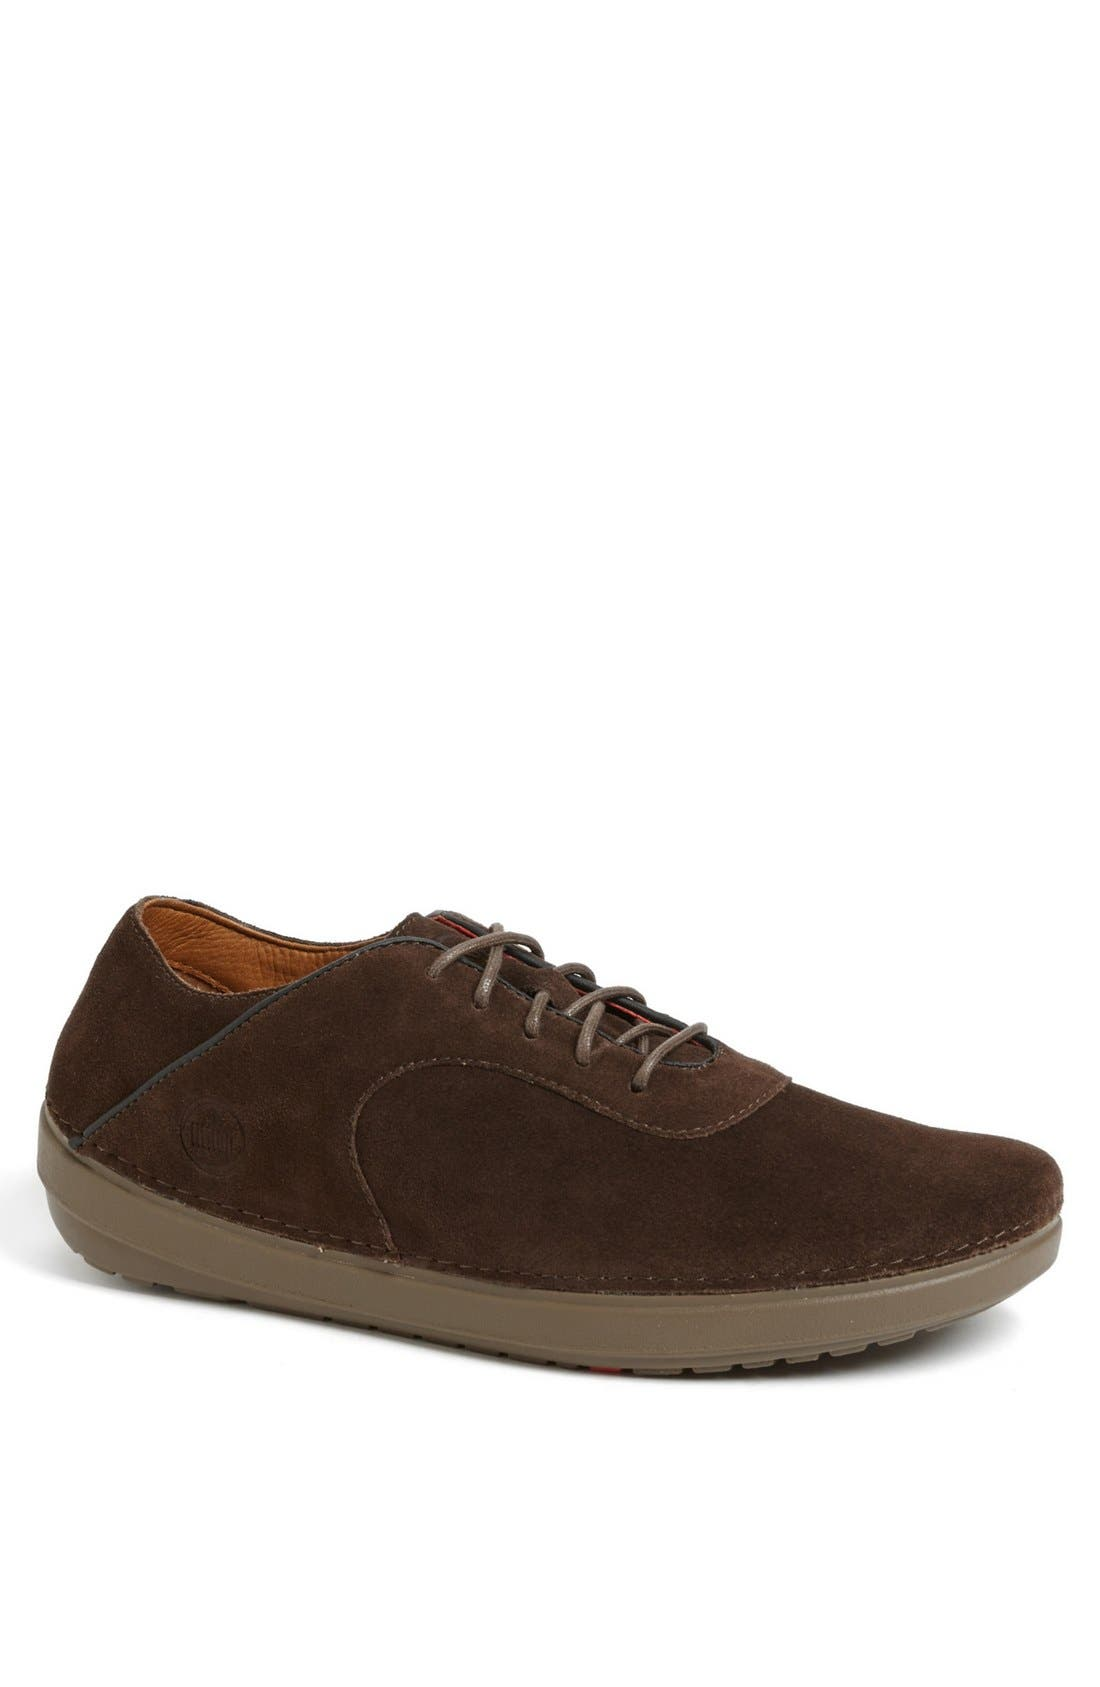 Alternate Image 1 Selected - FitFlop 'Flex™' Suede Sneaker (Men)